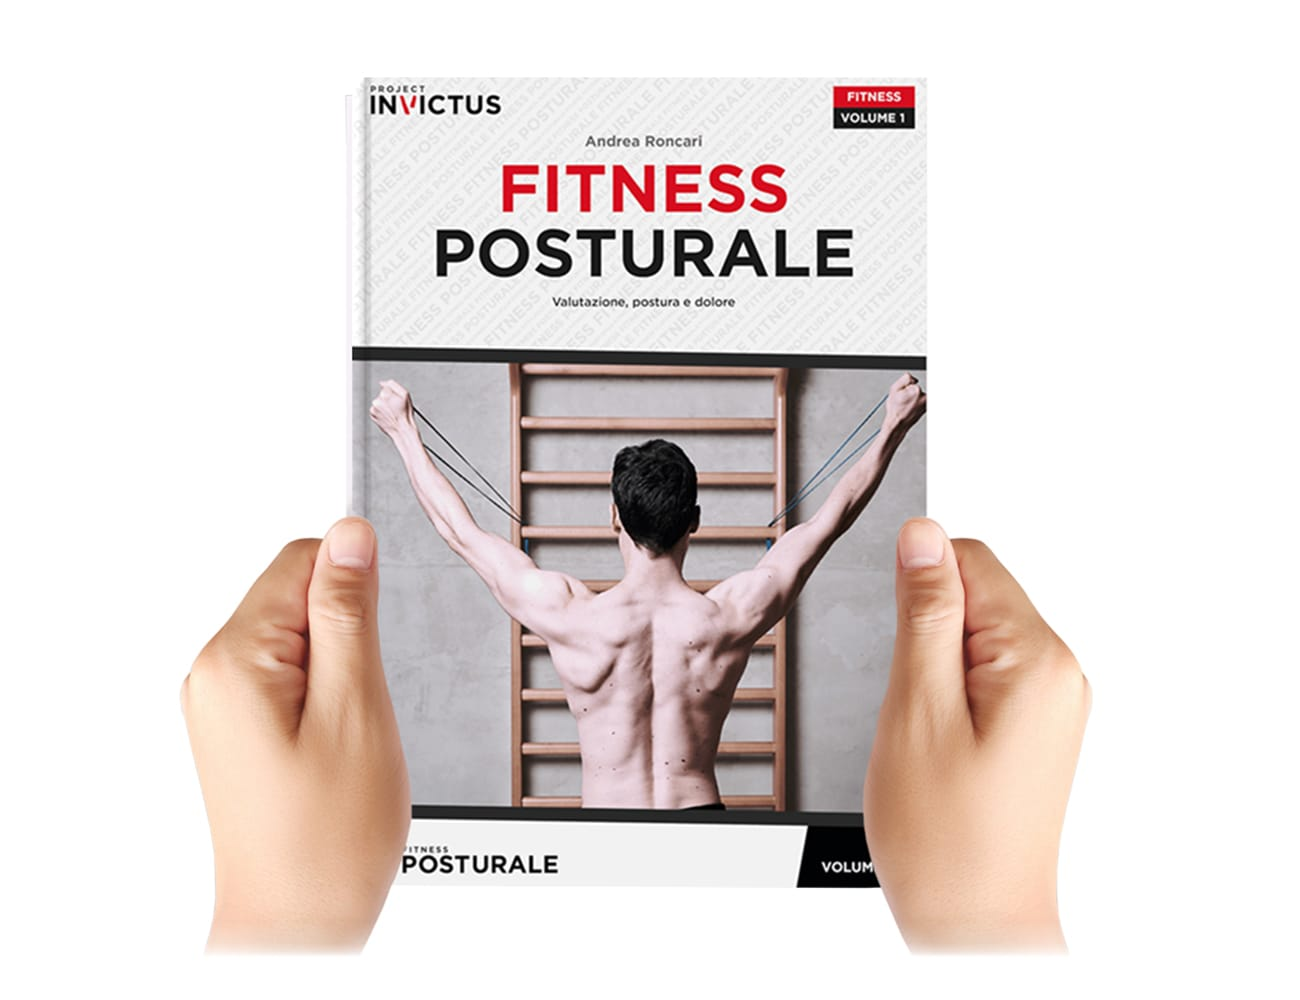 Fitness Posturale Libro